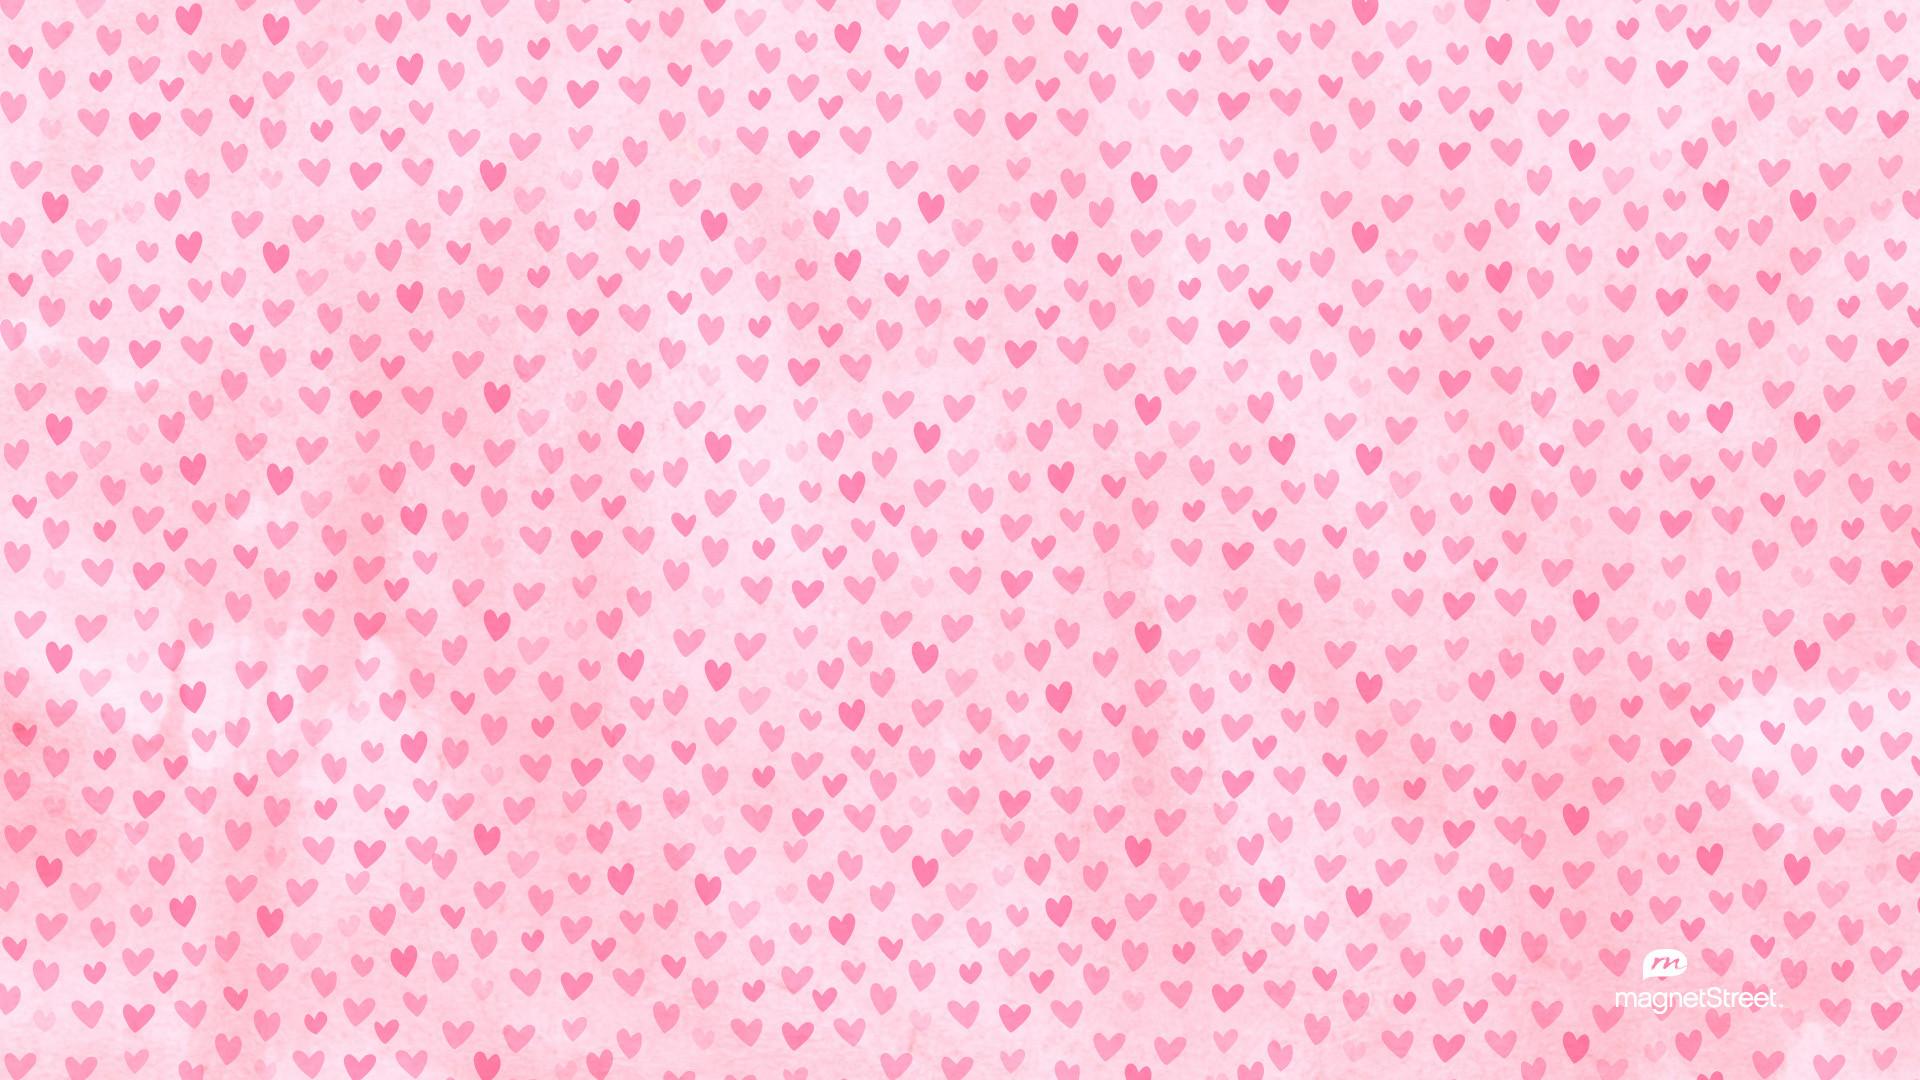 Hearts Background Heart Wallpaper 23051wall.jpg